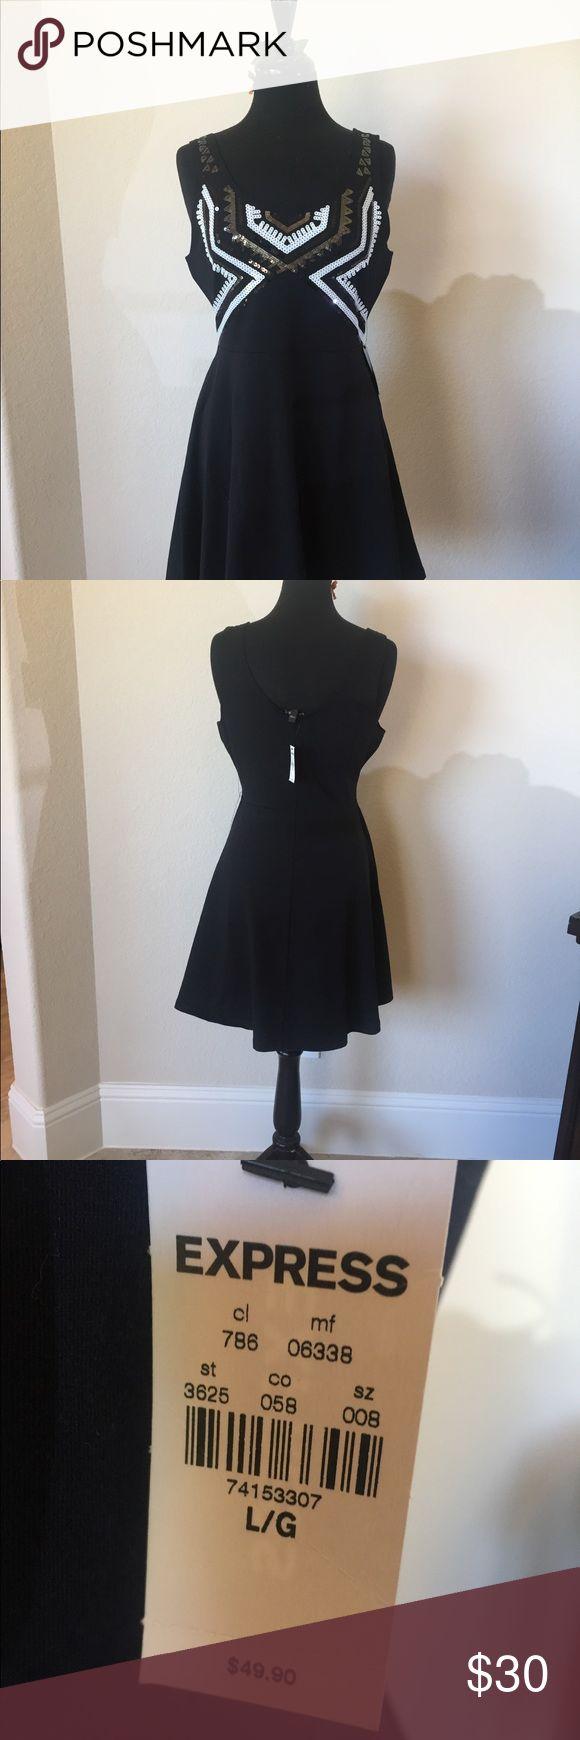 Beautiful Black Sundress with Sequins NWT Brand new, never worn Express sundress Express Dresses Midi